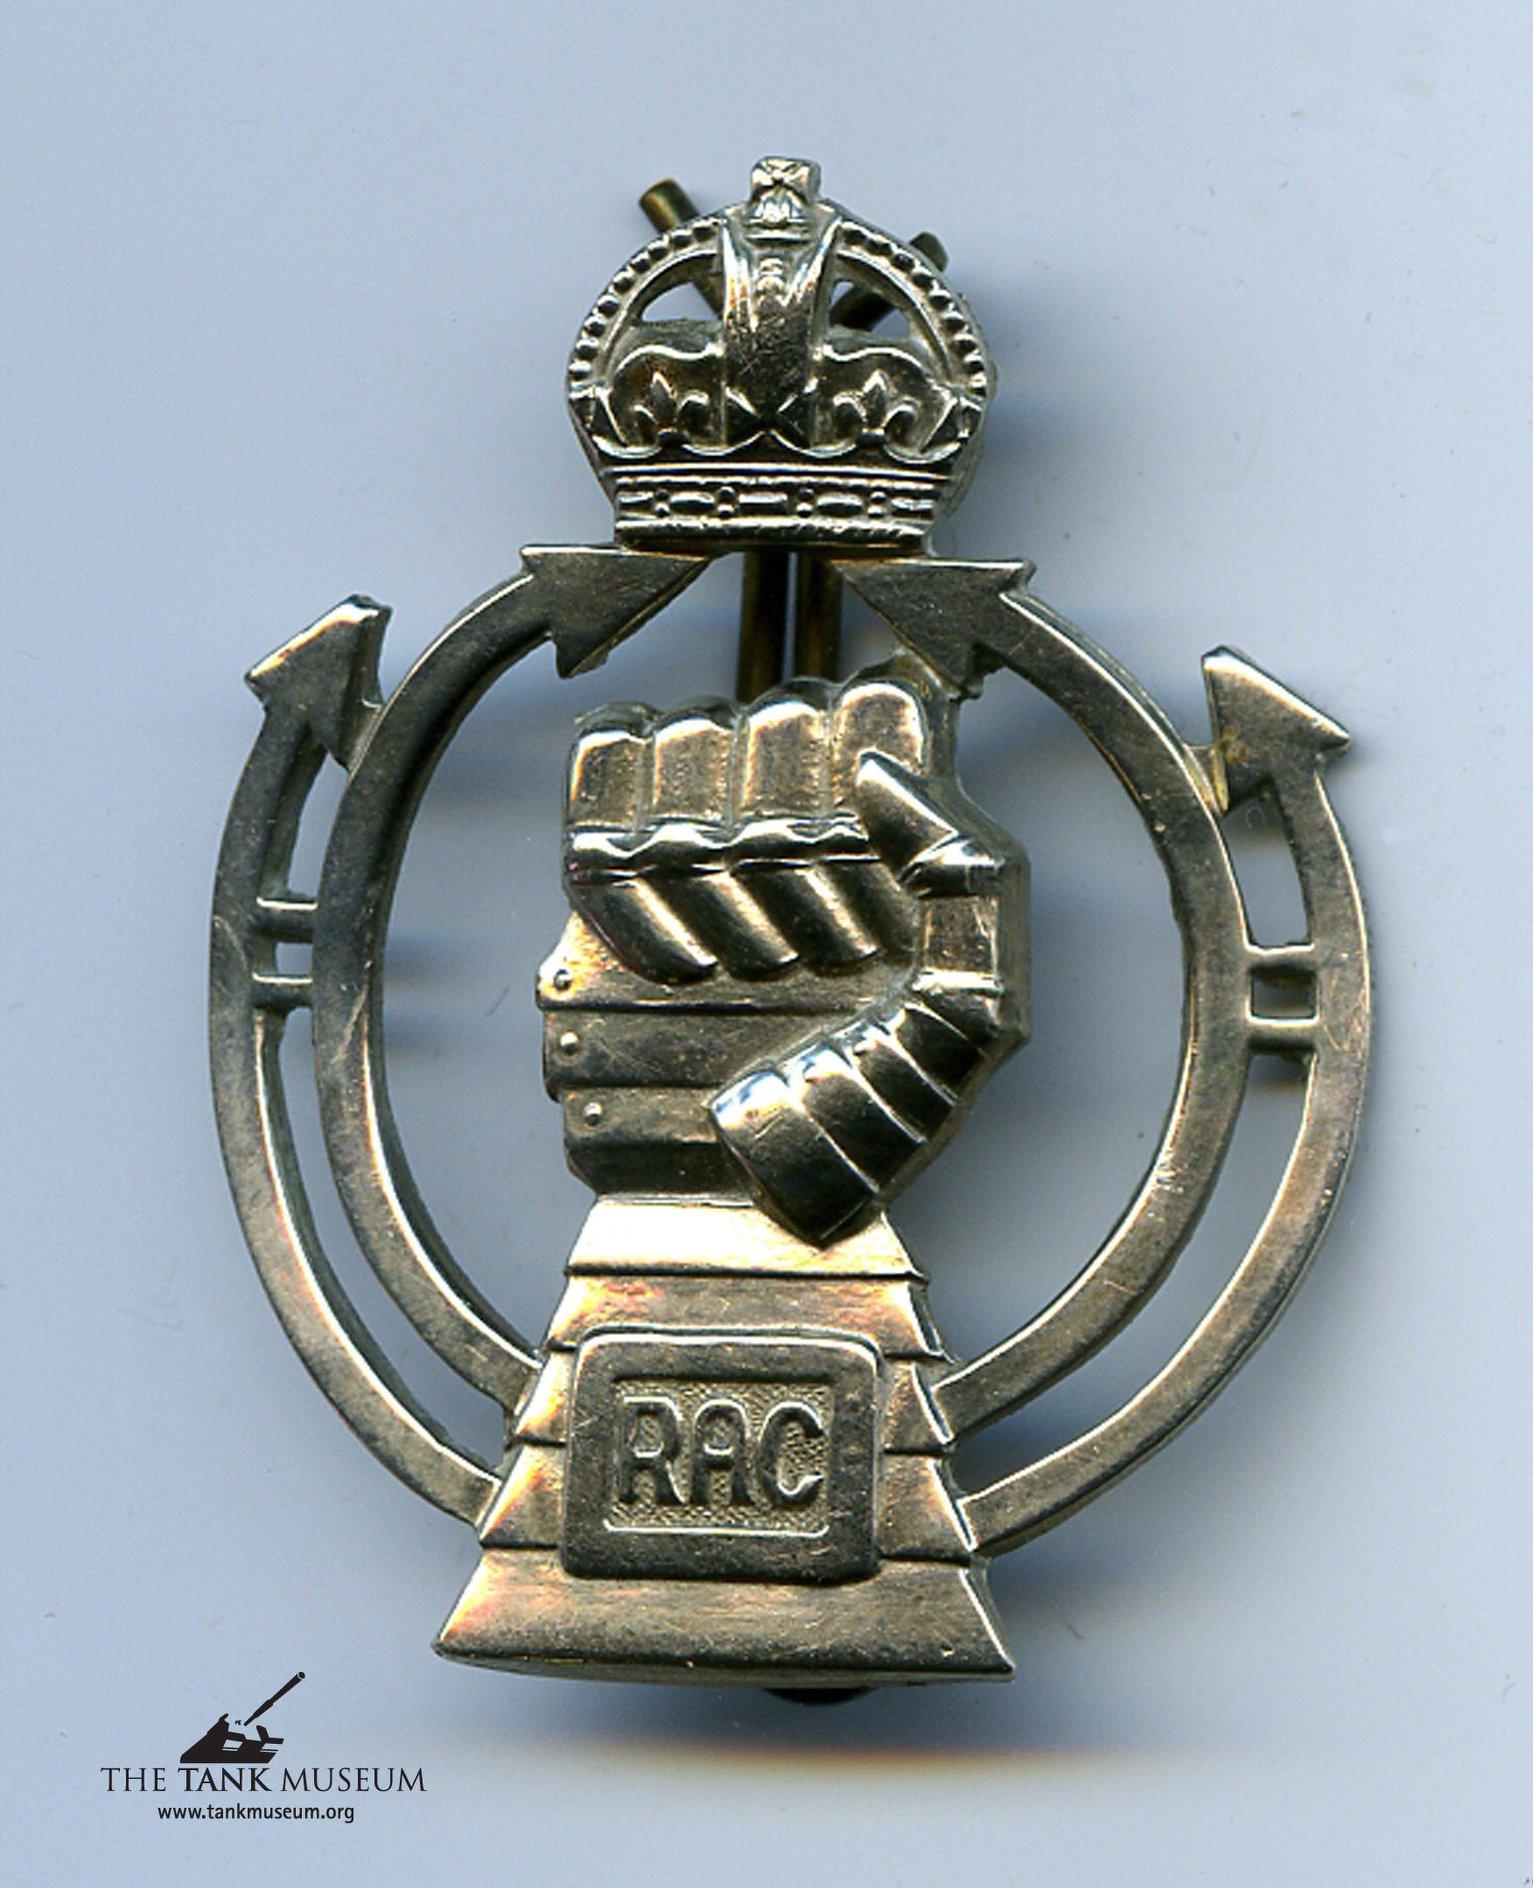 rac badge.jpg